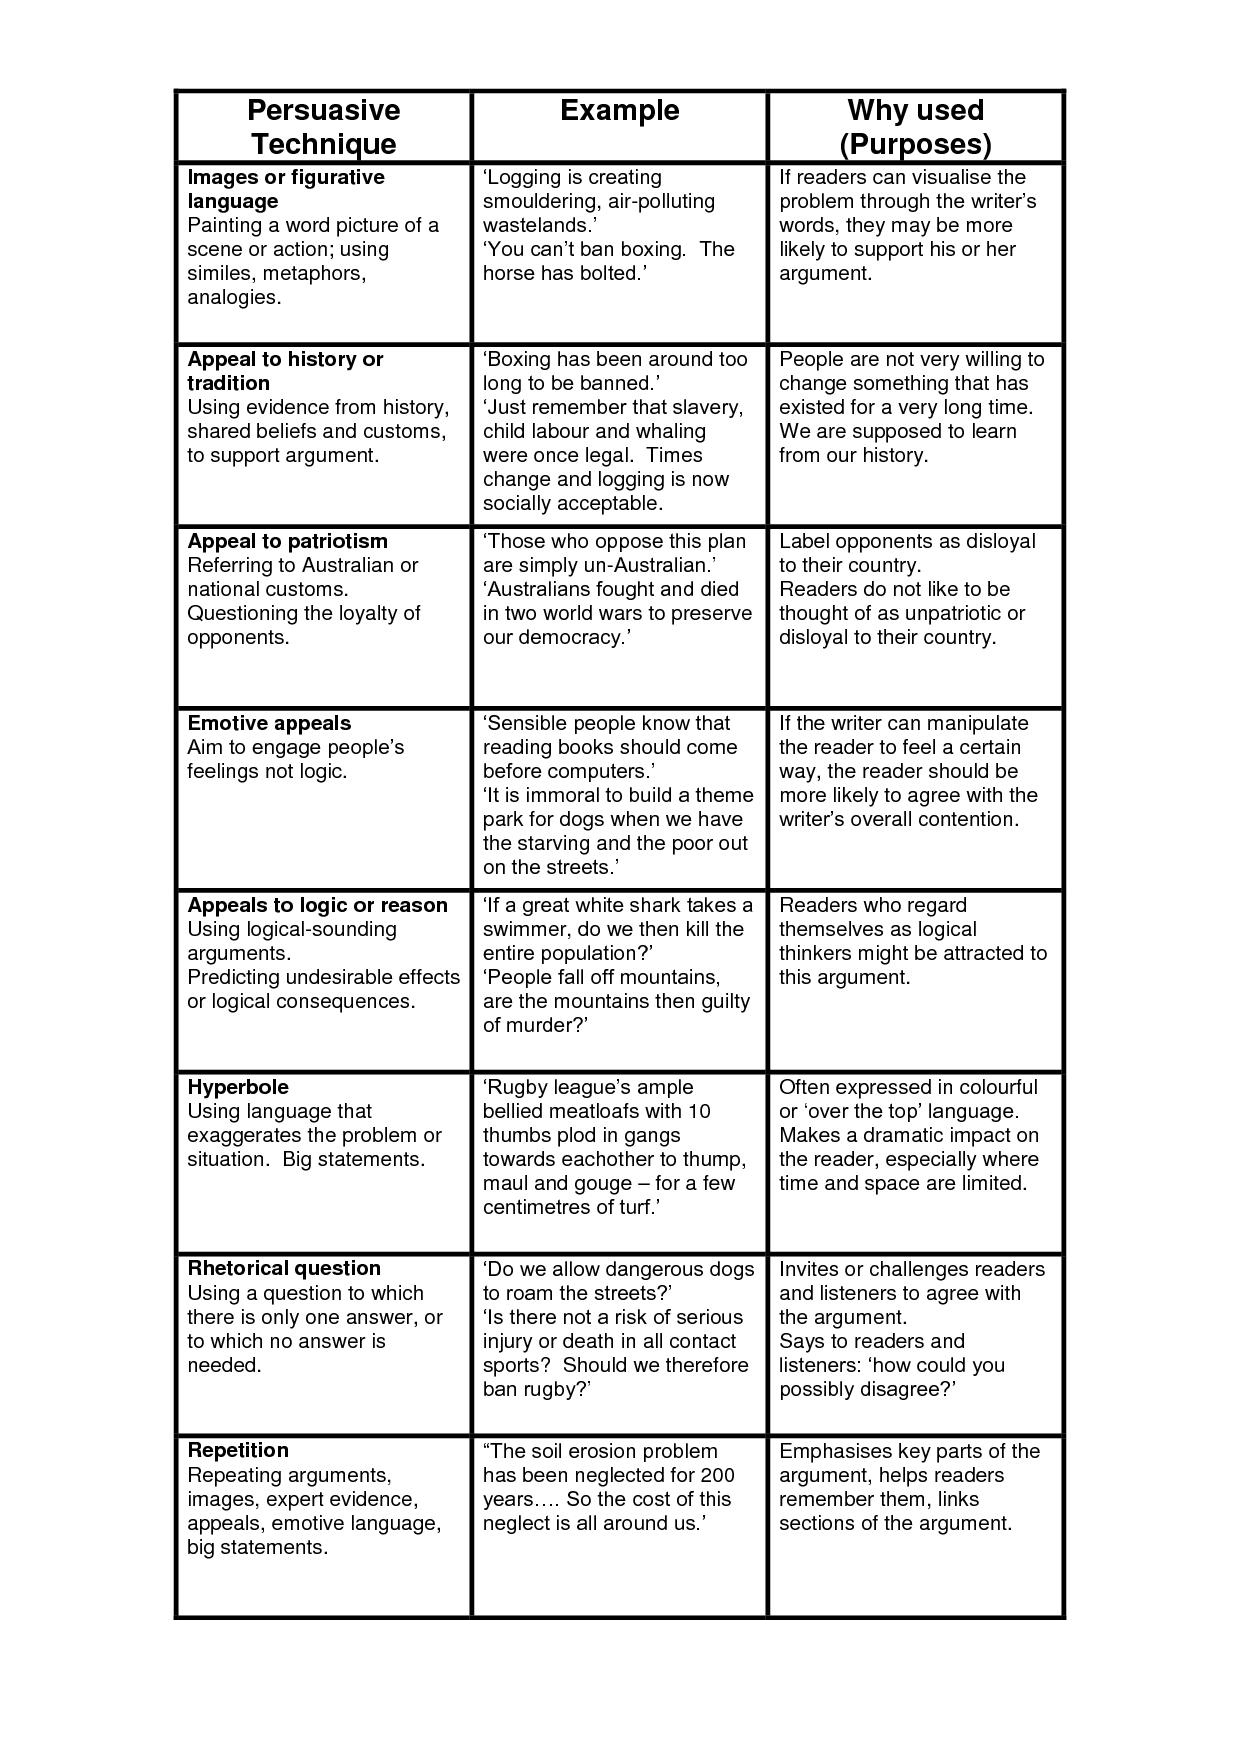 small resolution of Persuasion techniques   Persuasive techniques